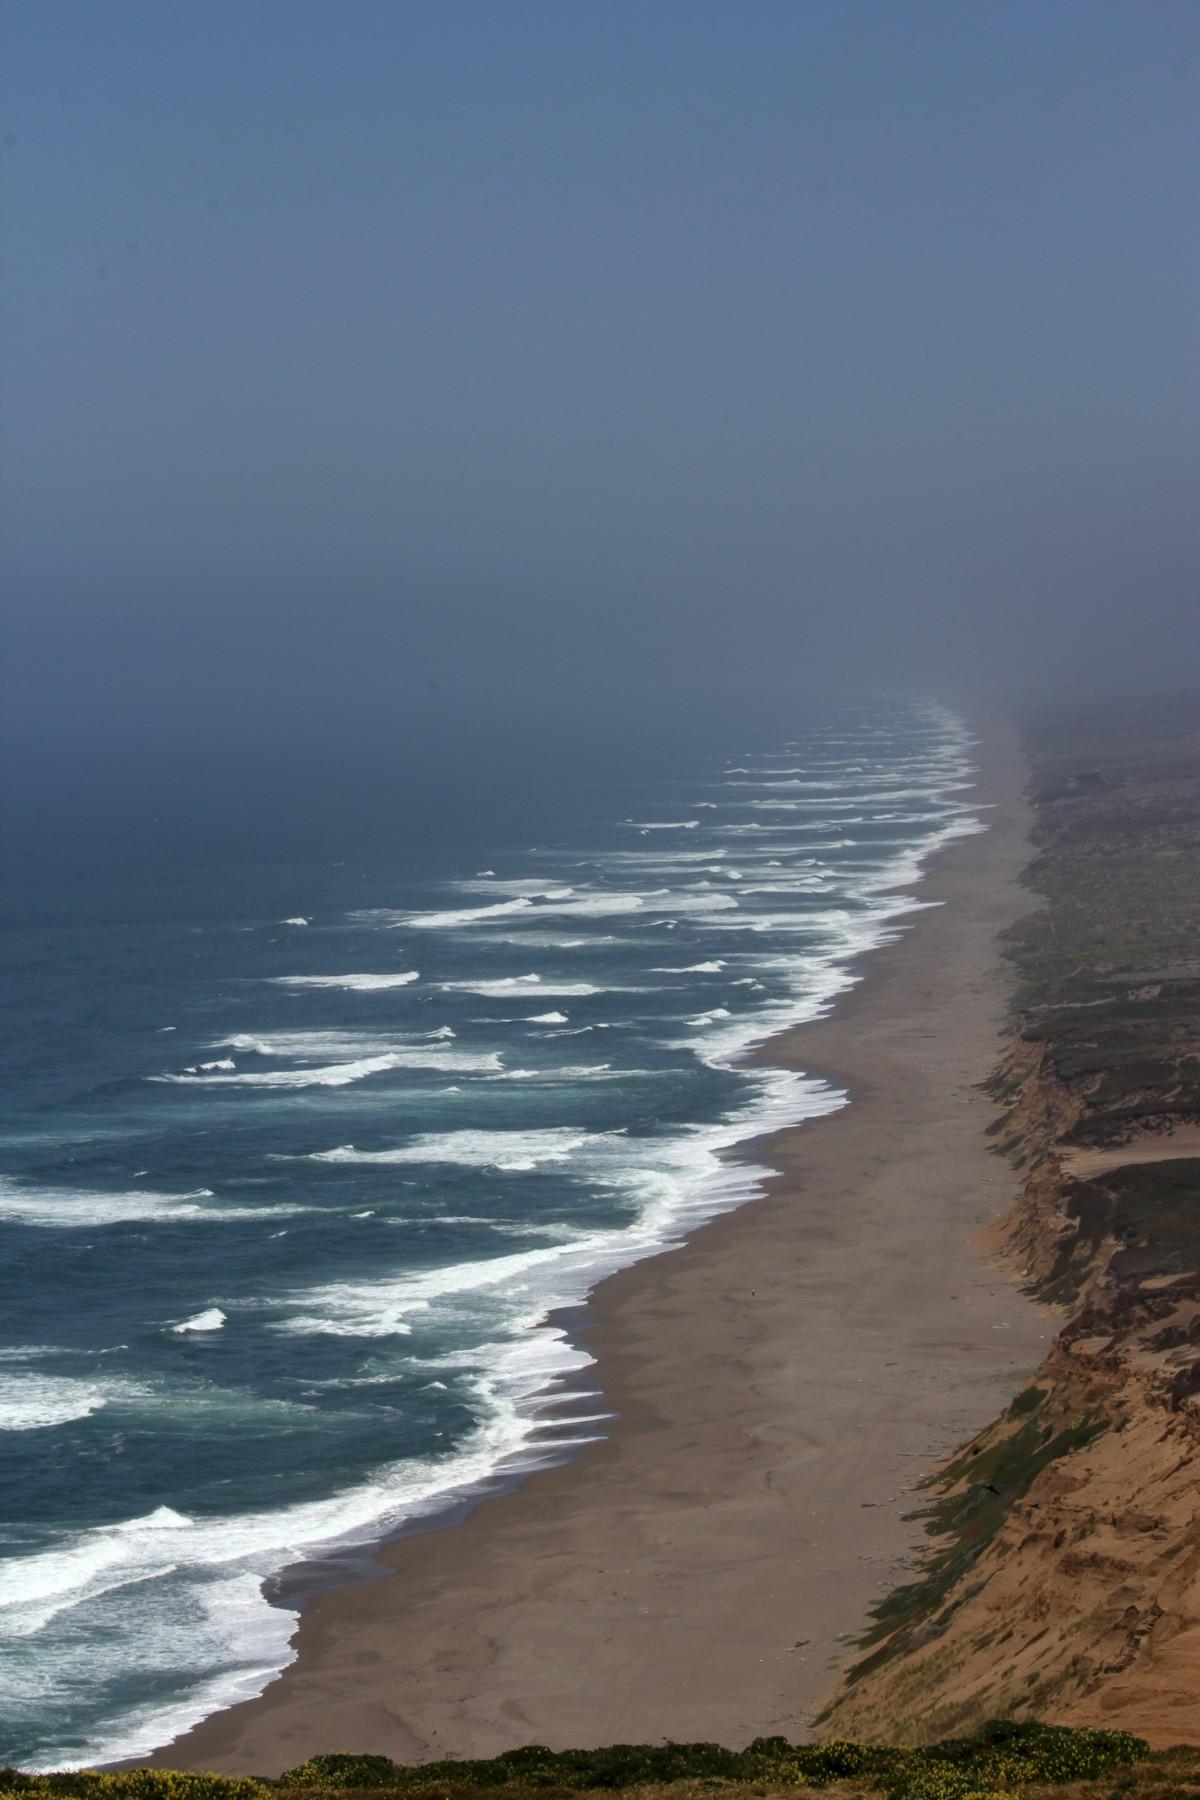 La spiaggia infinita...